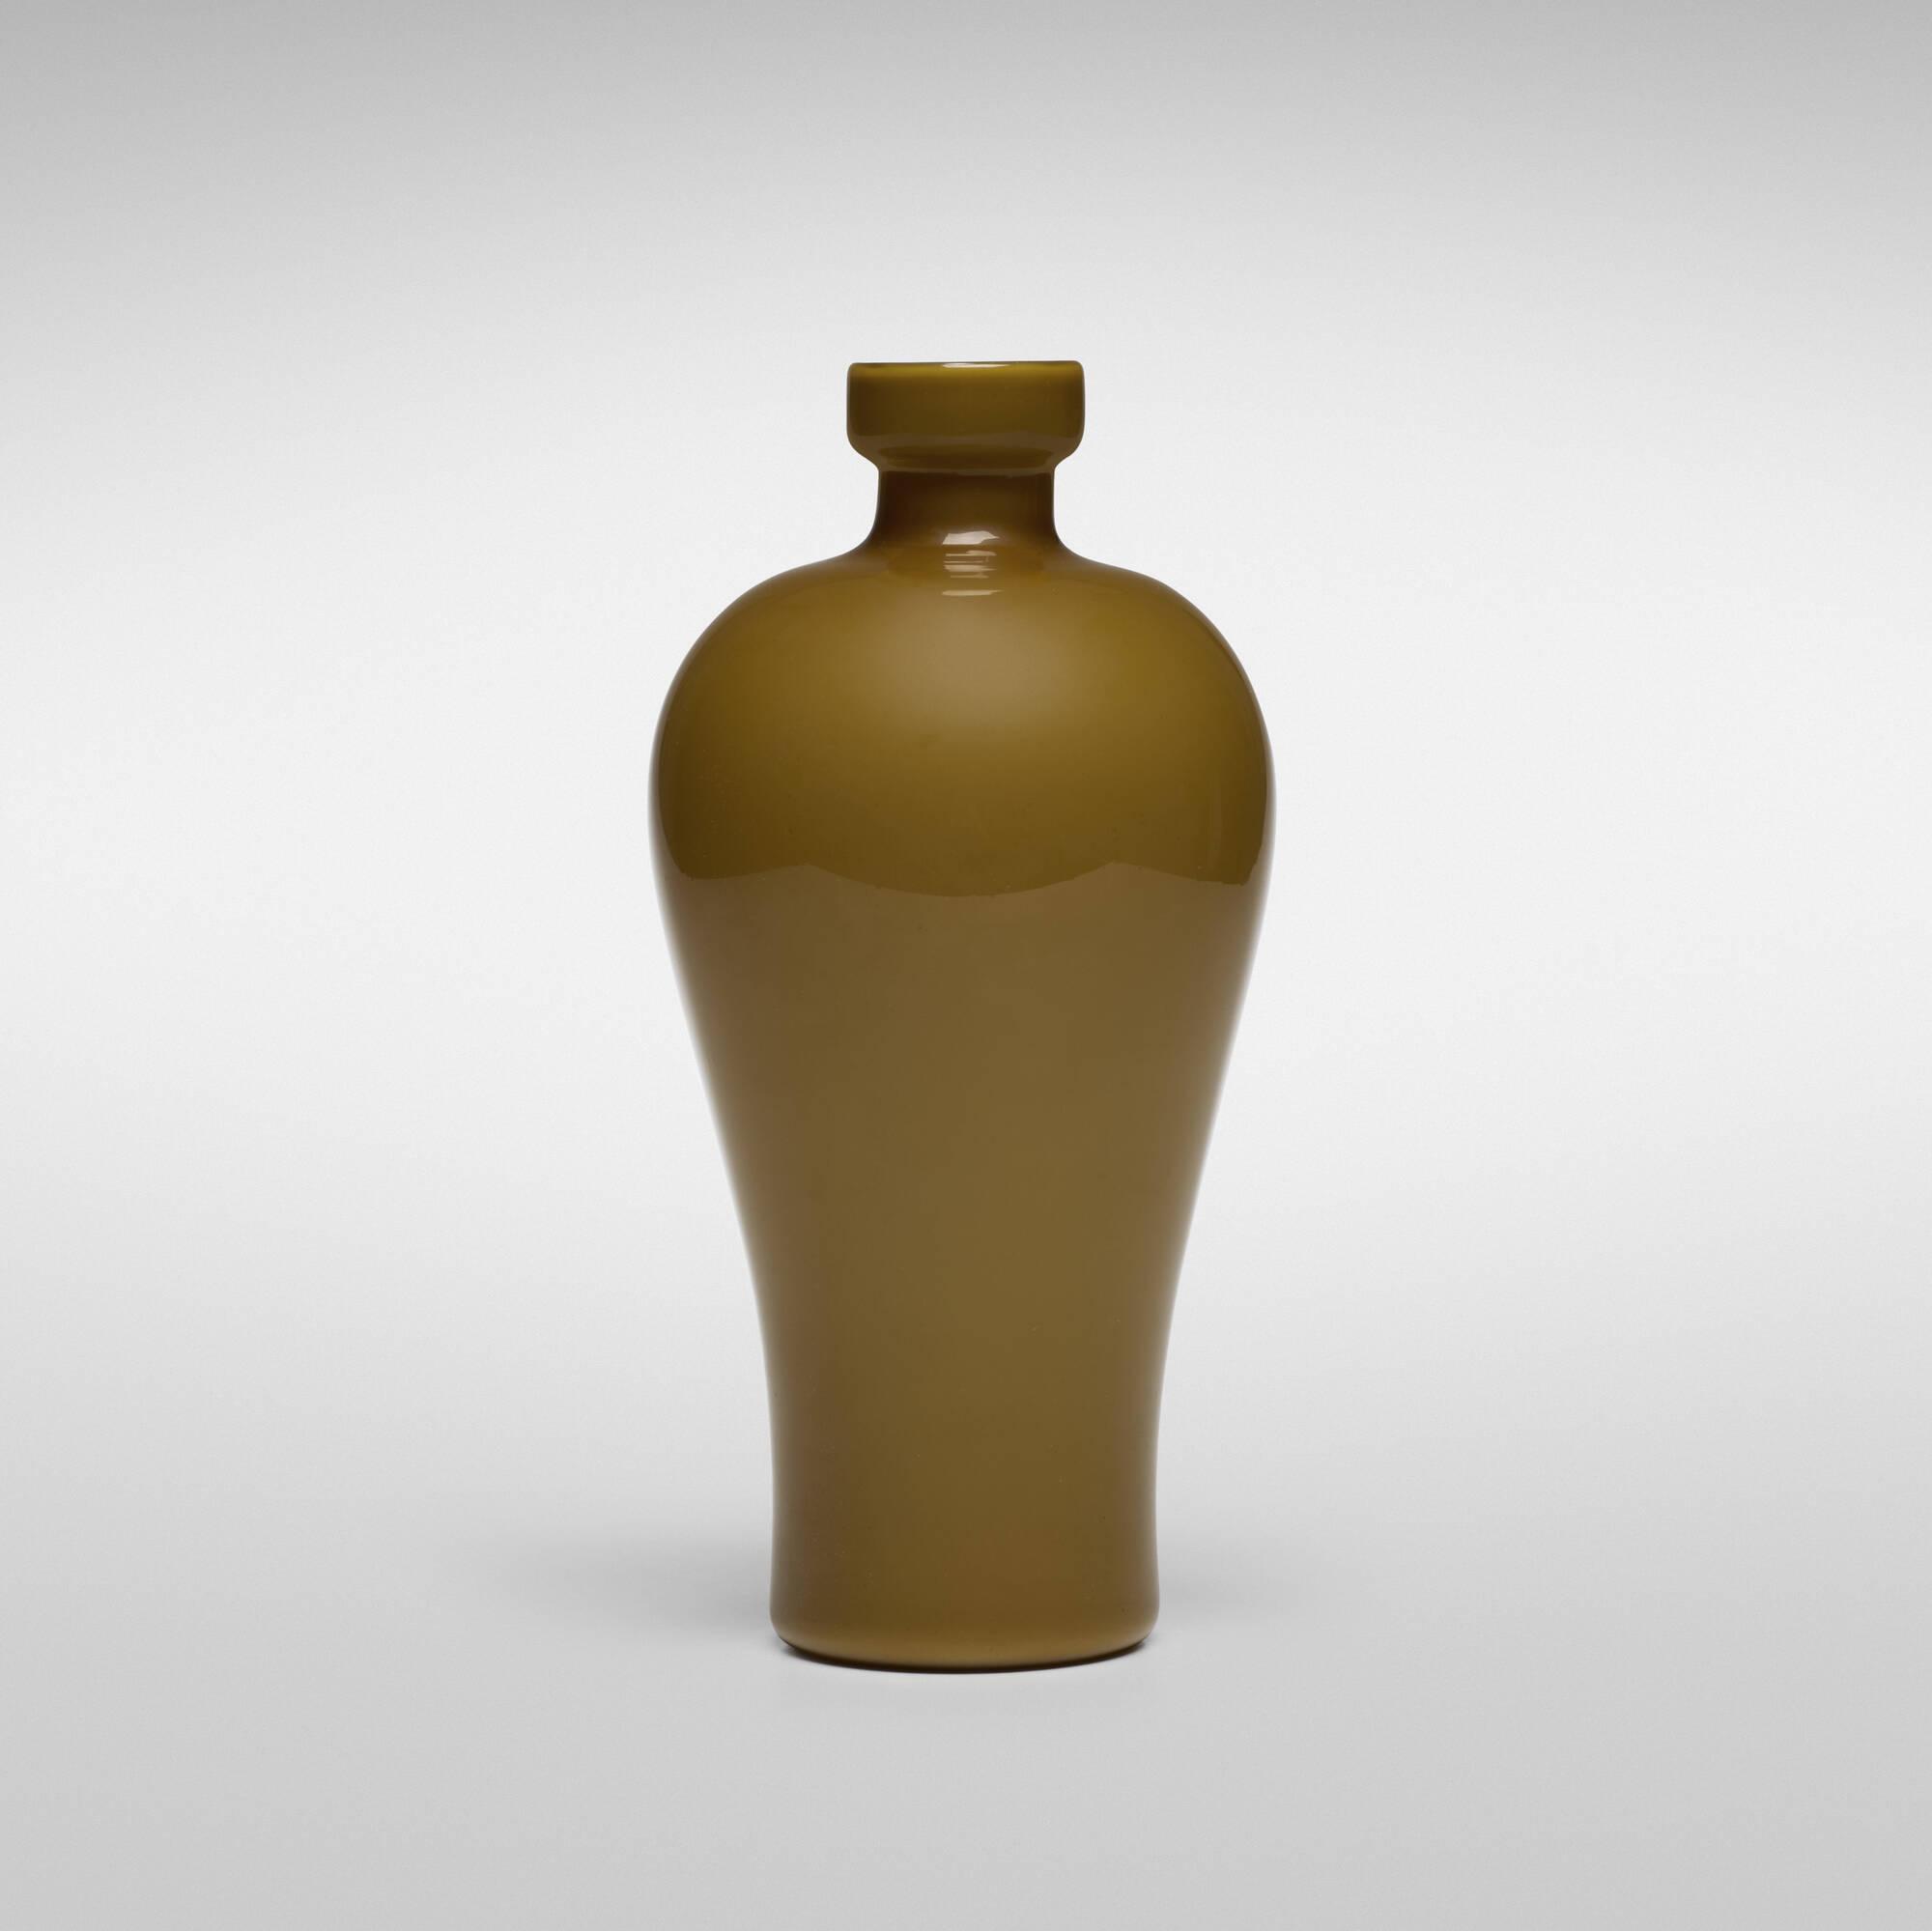 124 carlo scarpa cinesi vase model 3578 important italian 124 carlo scarpa cinesi vase model 3578 1 of 2 floridaeventfo Image collections